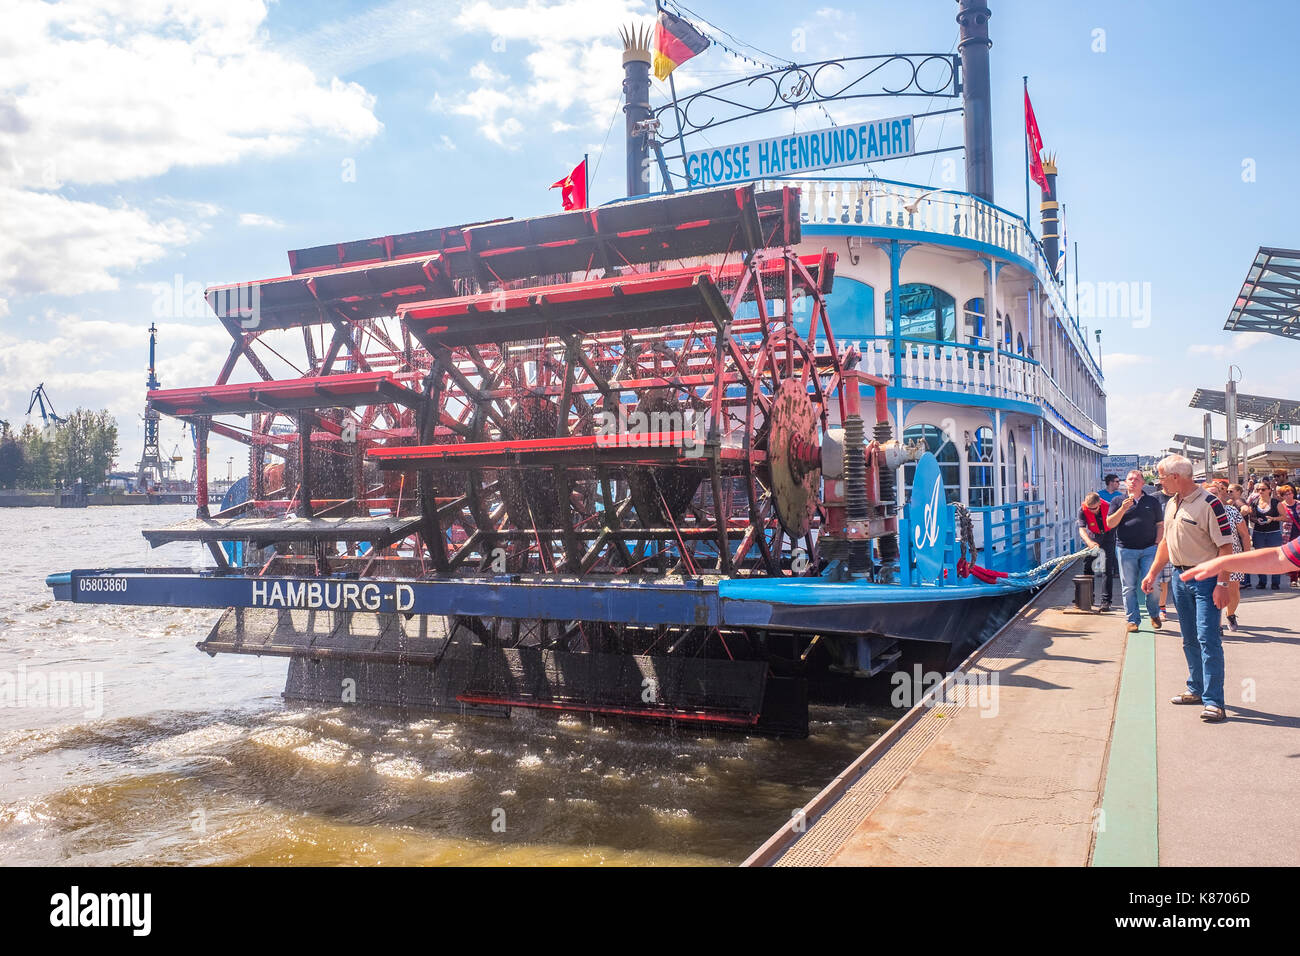 Grosse Hafenrundfahrt Paddle Steamer on River Elbe Hamburg - Stock Image